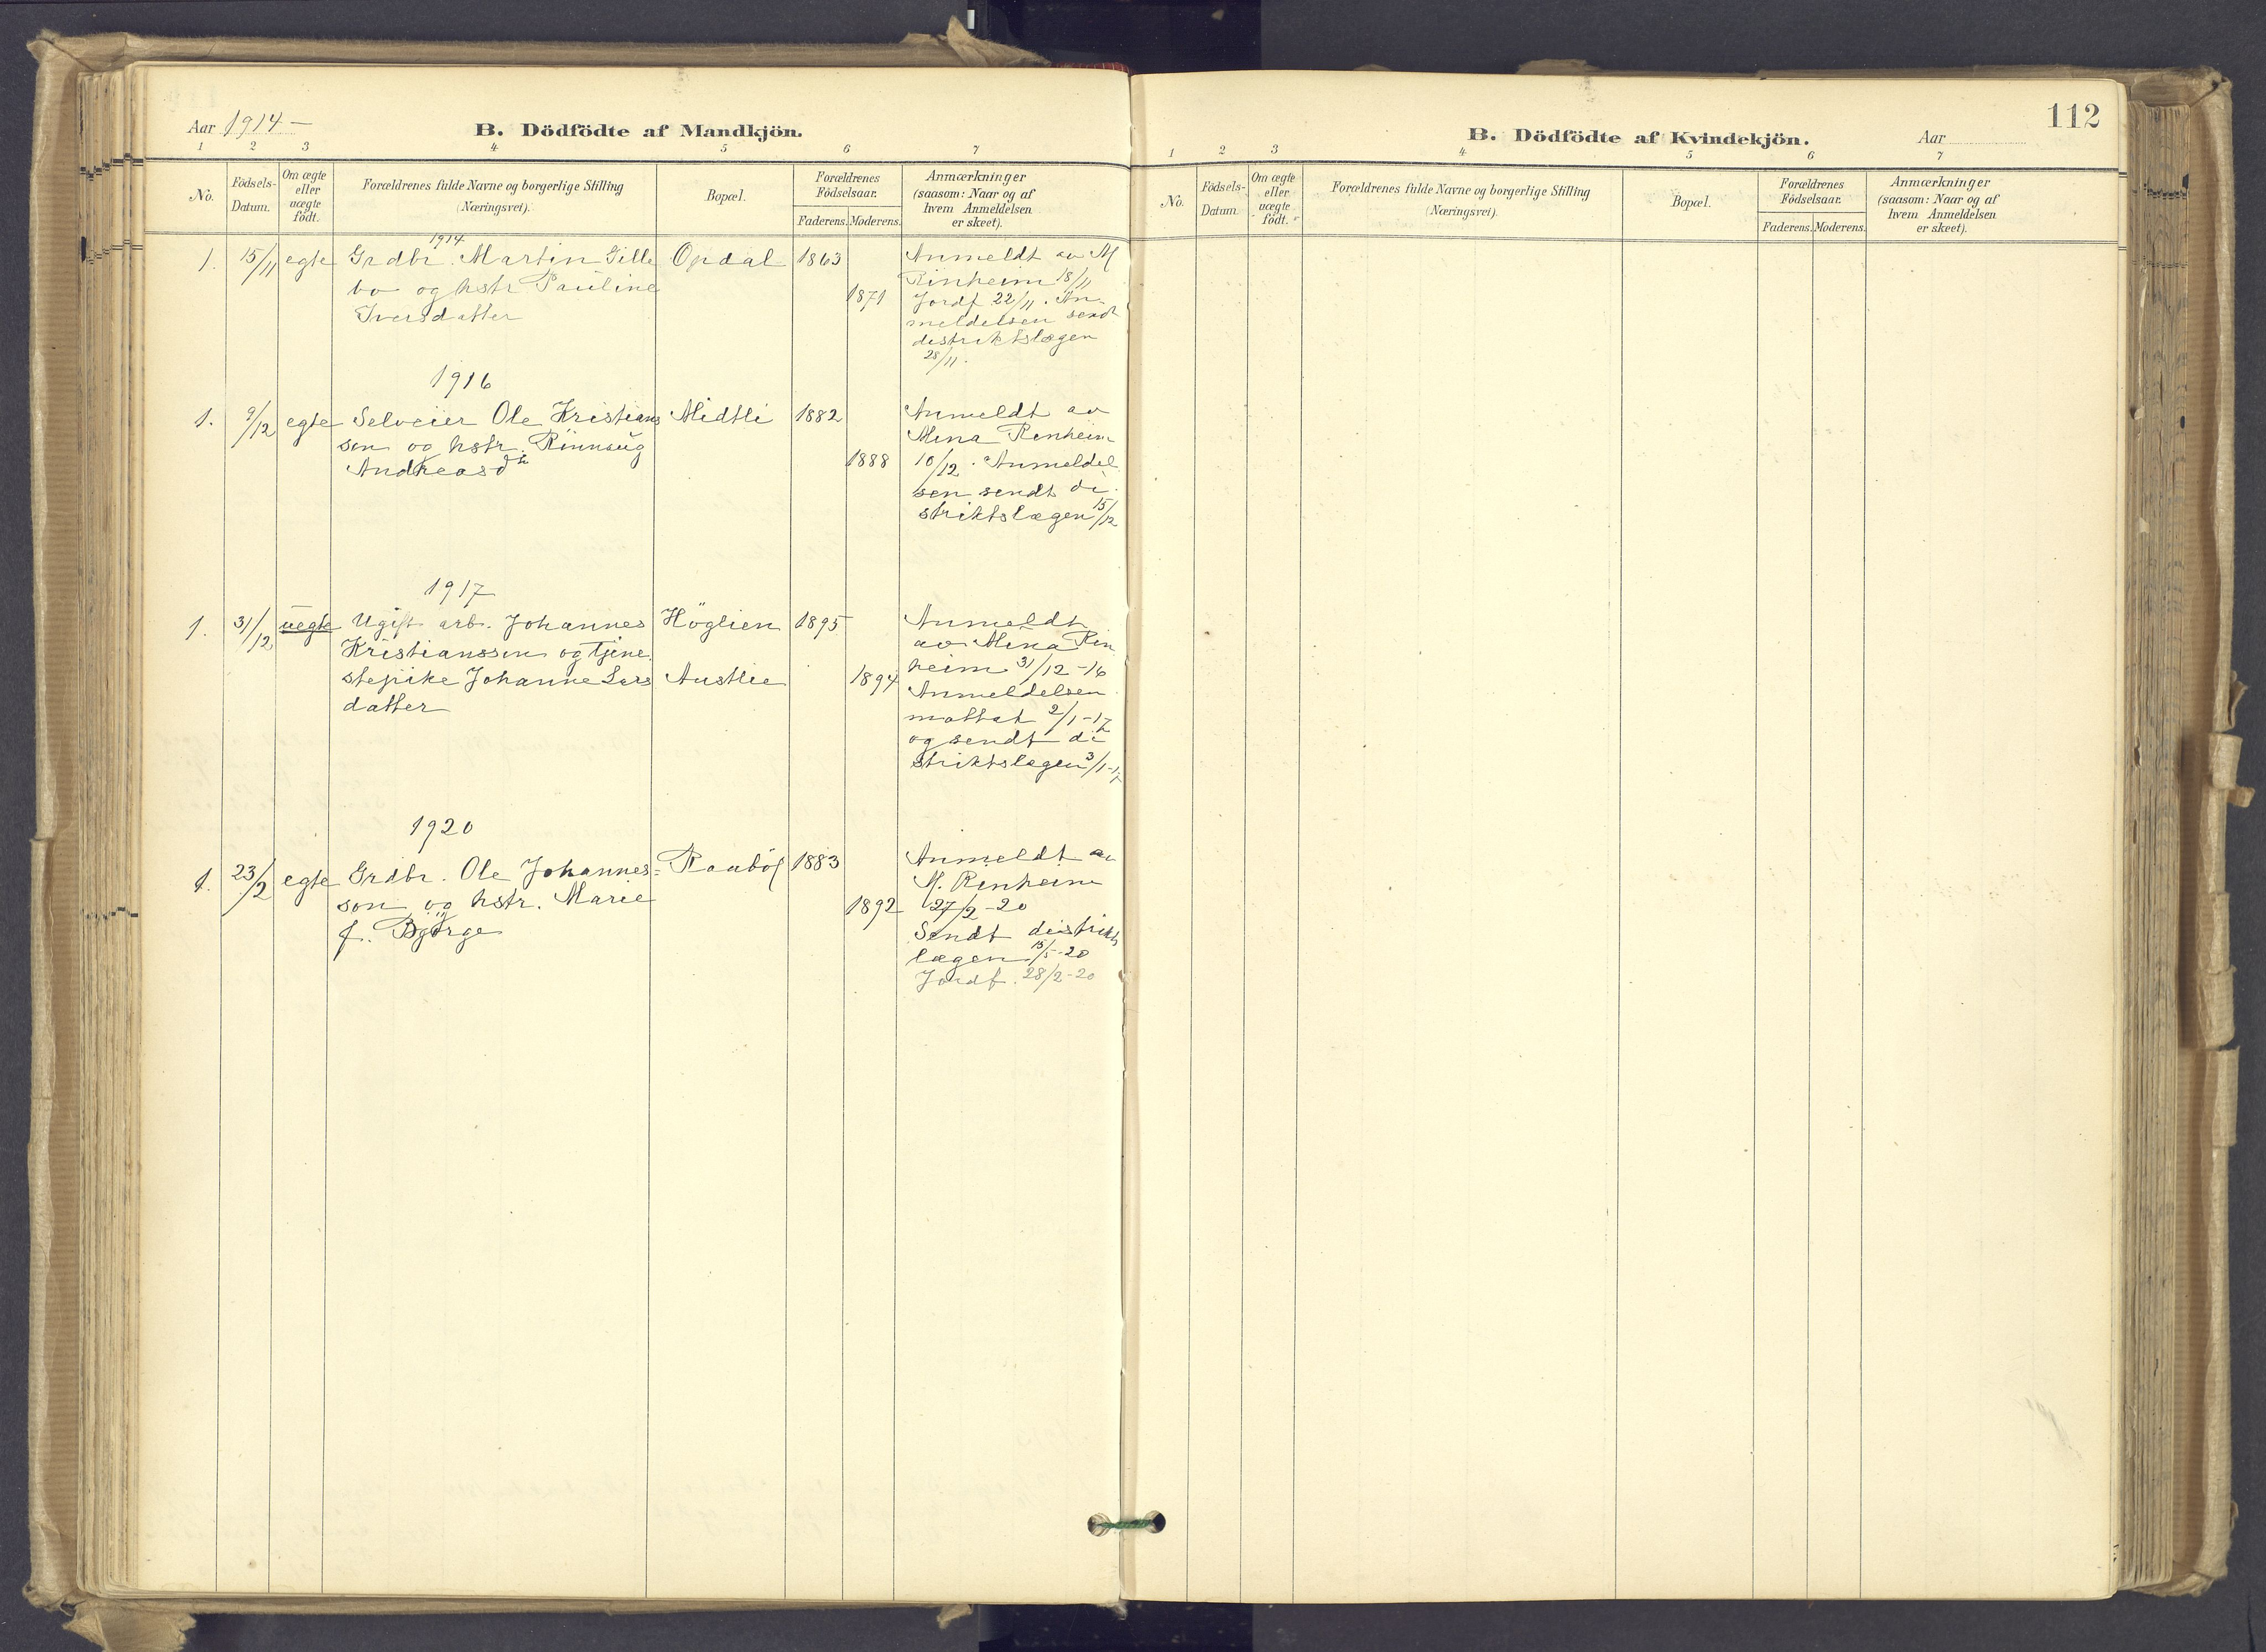 SAH, Øyer prestekontor, Ministerialbok nr. 12, 1897-1920, s. 112